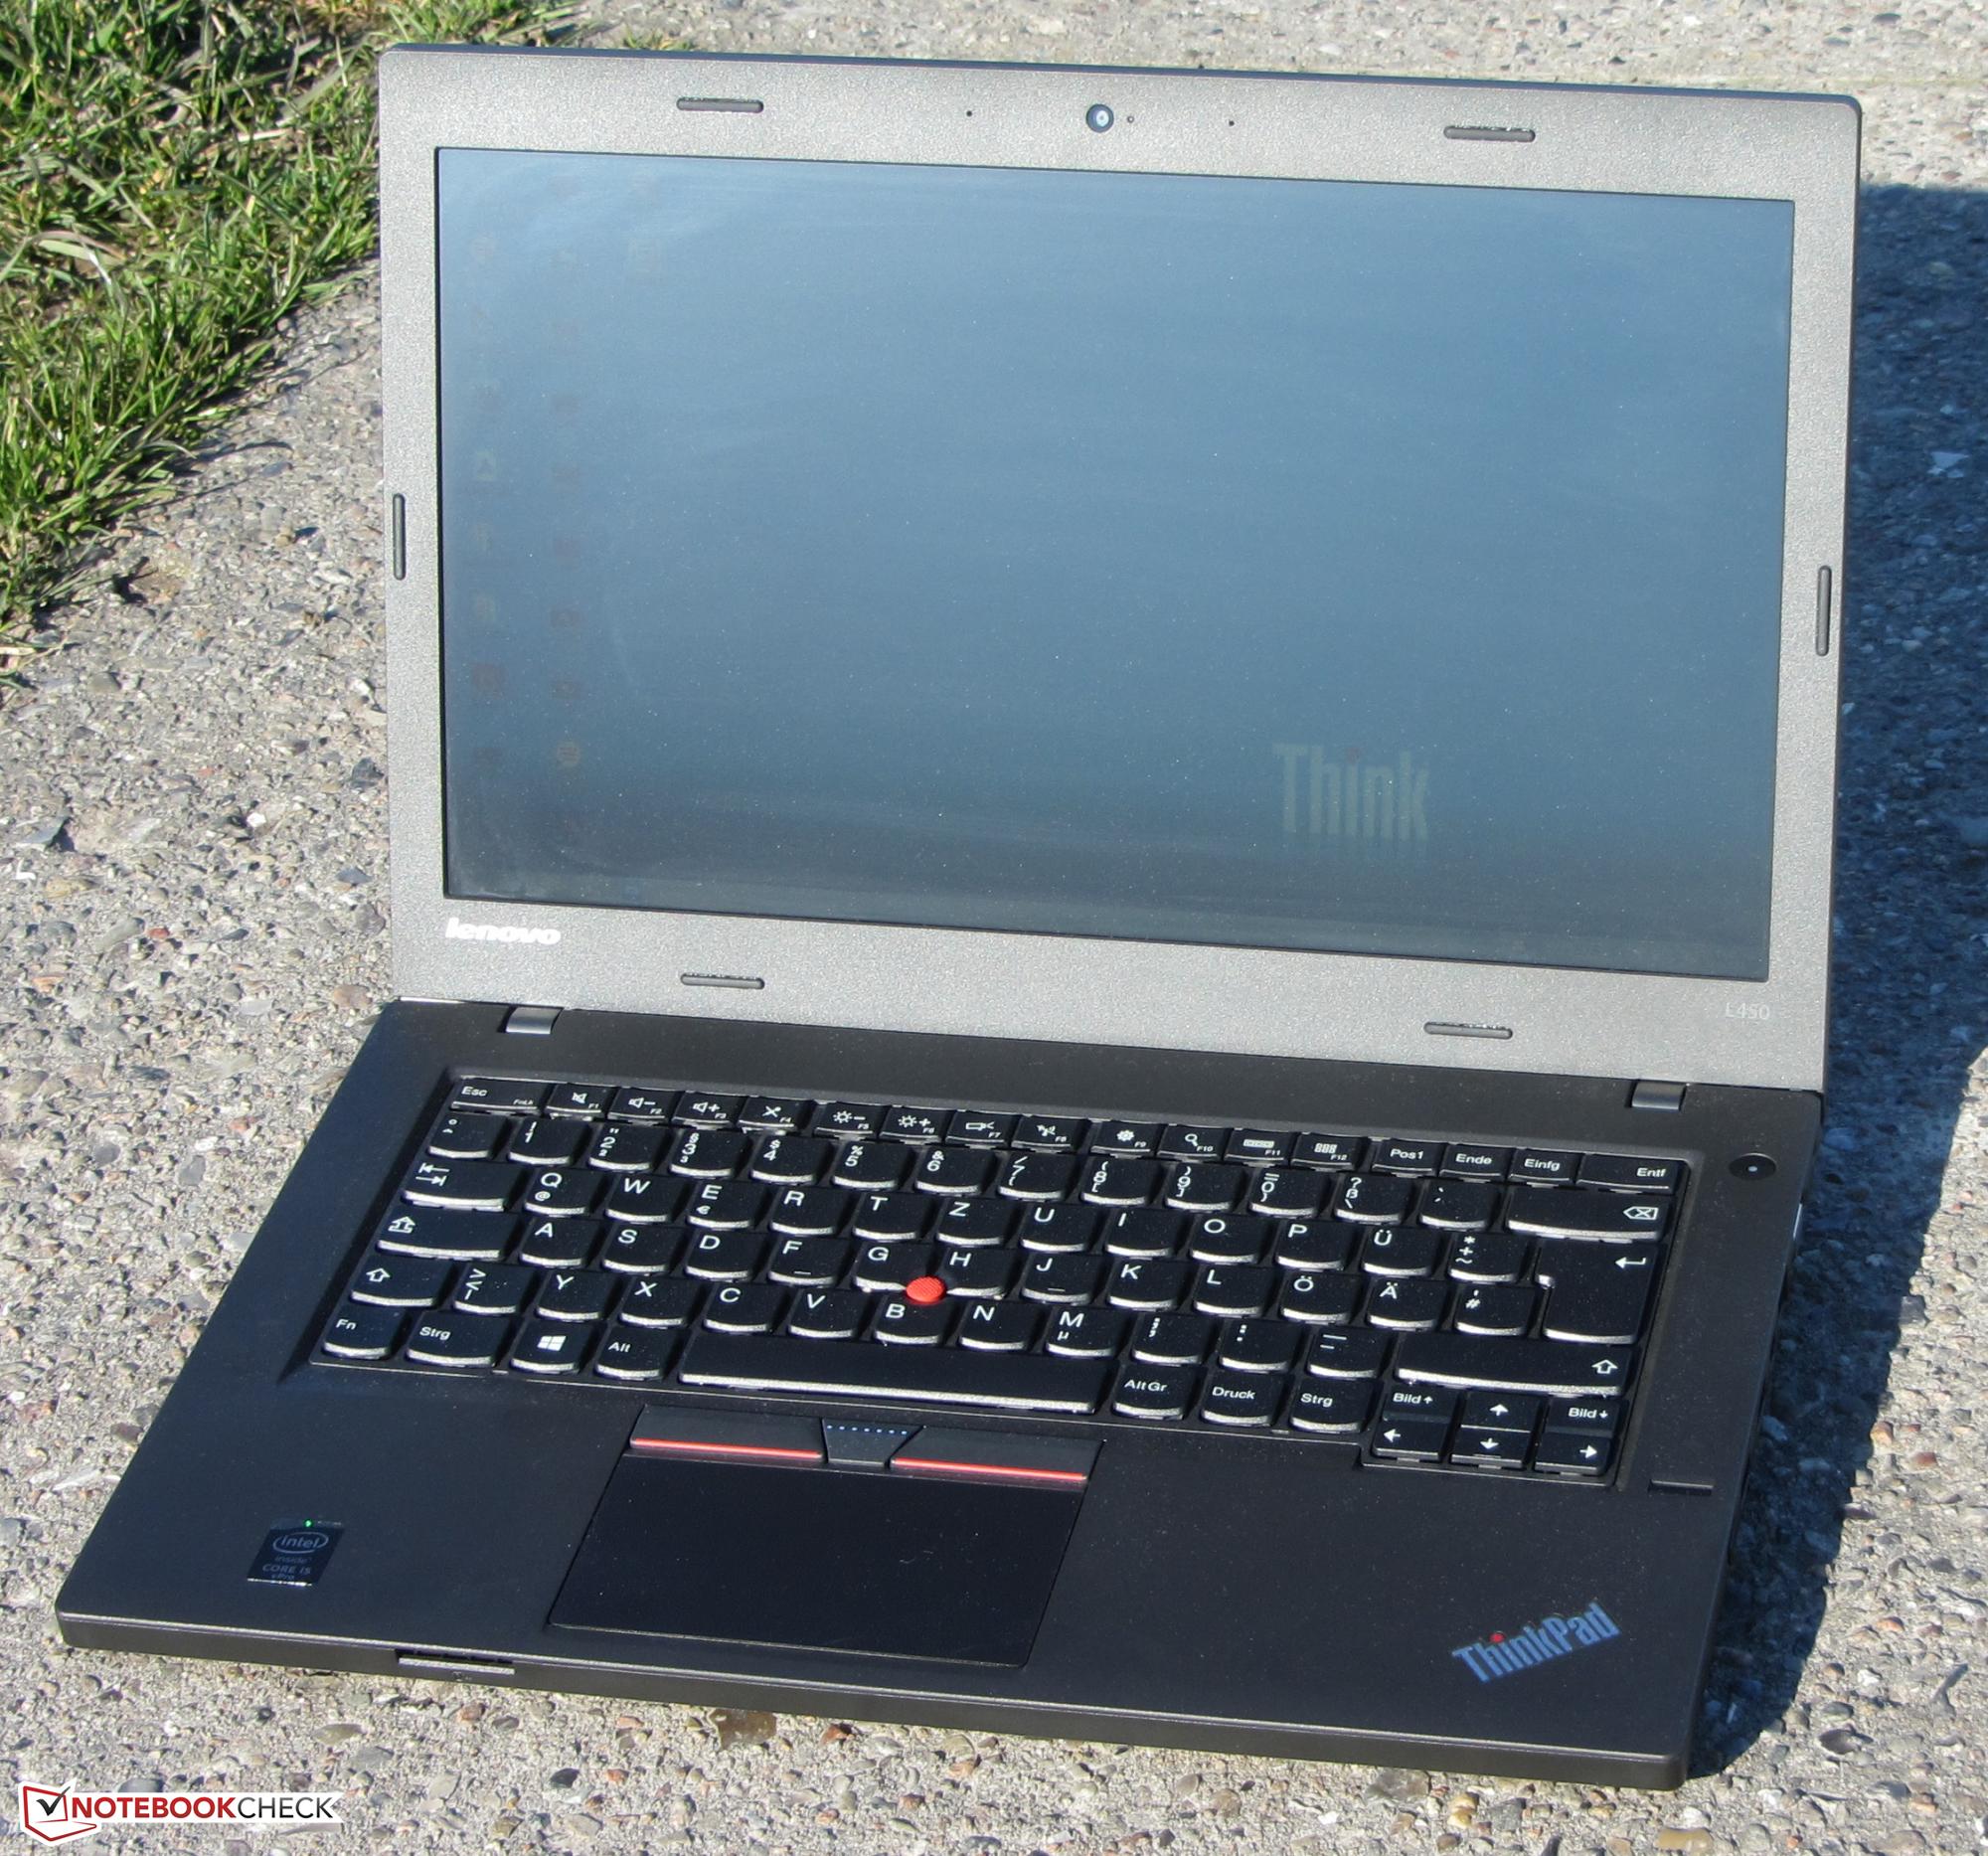 Lenovo ThinkPad L450 64Bit